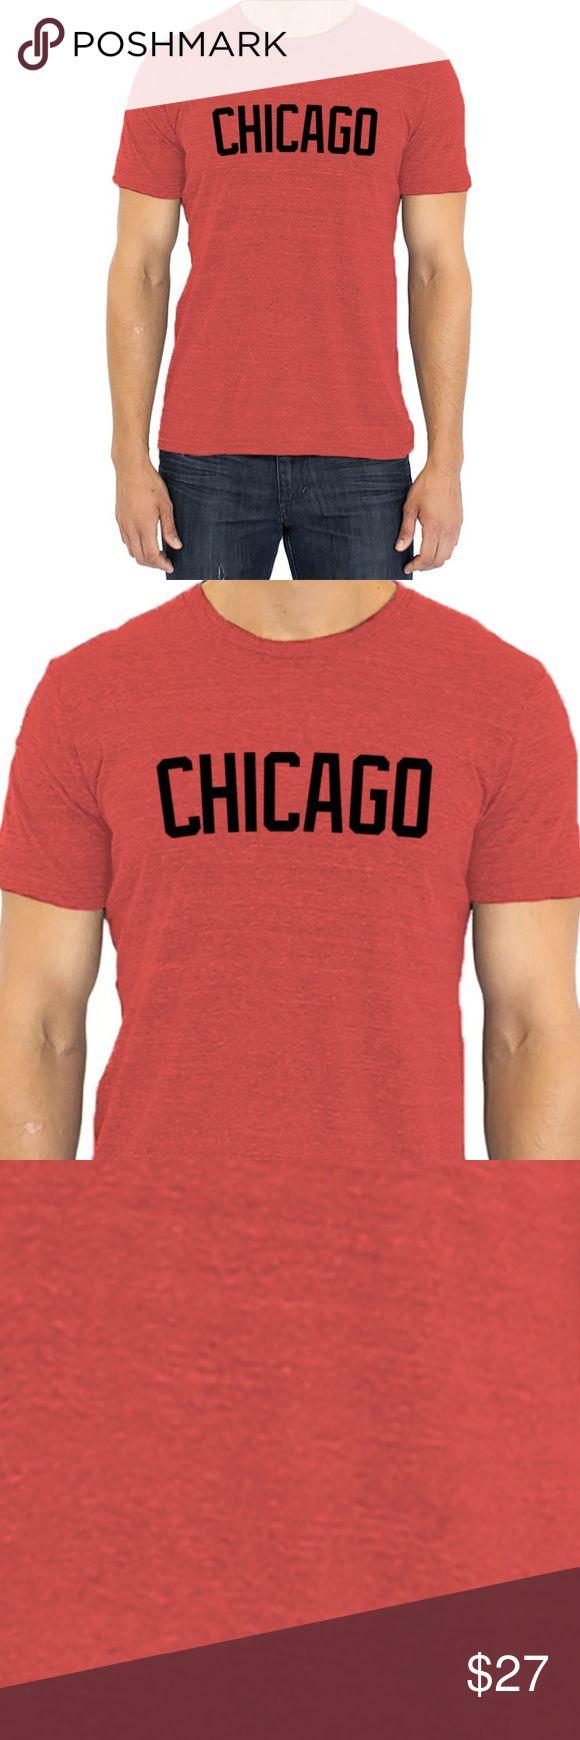 Chicago Vintage Block Letter Tri-Blend Shirt NWT Chicago Vintage Block Letter Shirt | Vintage Red Tri-Blend Chicago Sports Fashion T-Shirt | Air Jordan Shirt | Chicago Sports Pride Shirt | Chicago Bulls Shirt | Chicago Blackhawks Shirt | Chicago Bears Shirt | Chicago Cubs Shirt | Chicago White Sox Shirt | Michael Jordan Shirt | Chicago Illinois Shirt | Vintage Chicago Shirt  NWT  Fabric Color: Red Tri-Blend  50% polyester 37% cotton 13% rayon  Sizes: XS, S, M, L, XL, XXL, XXXL Shirts Tees…